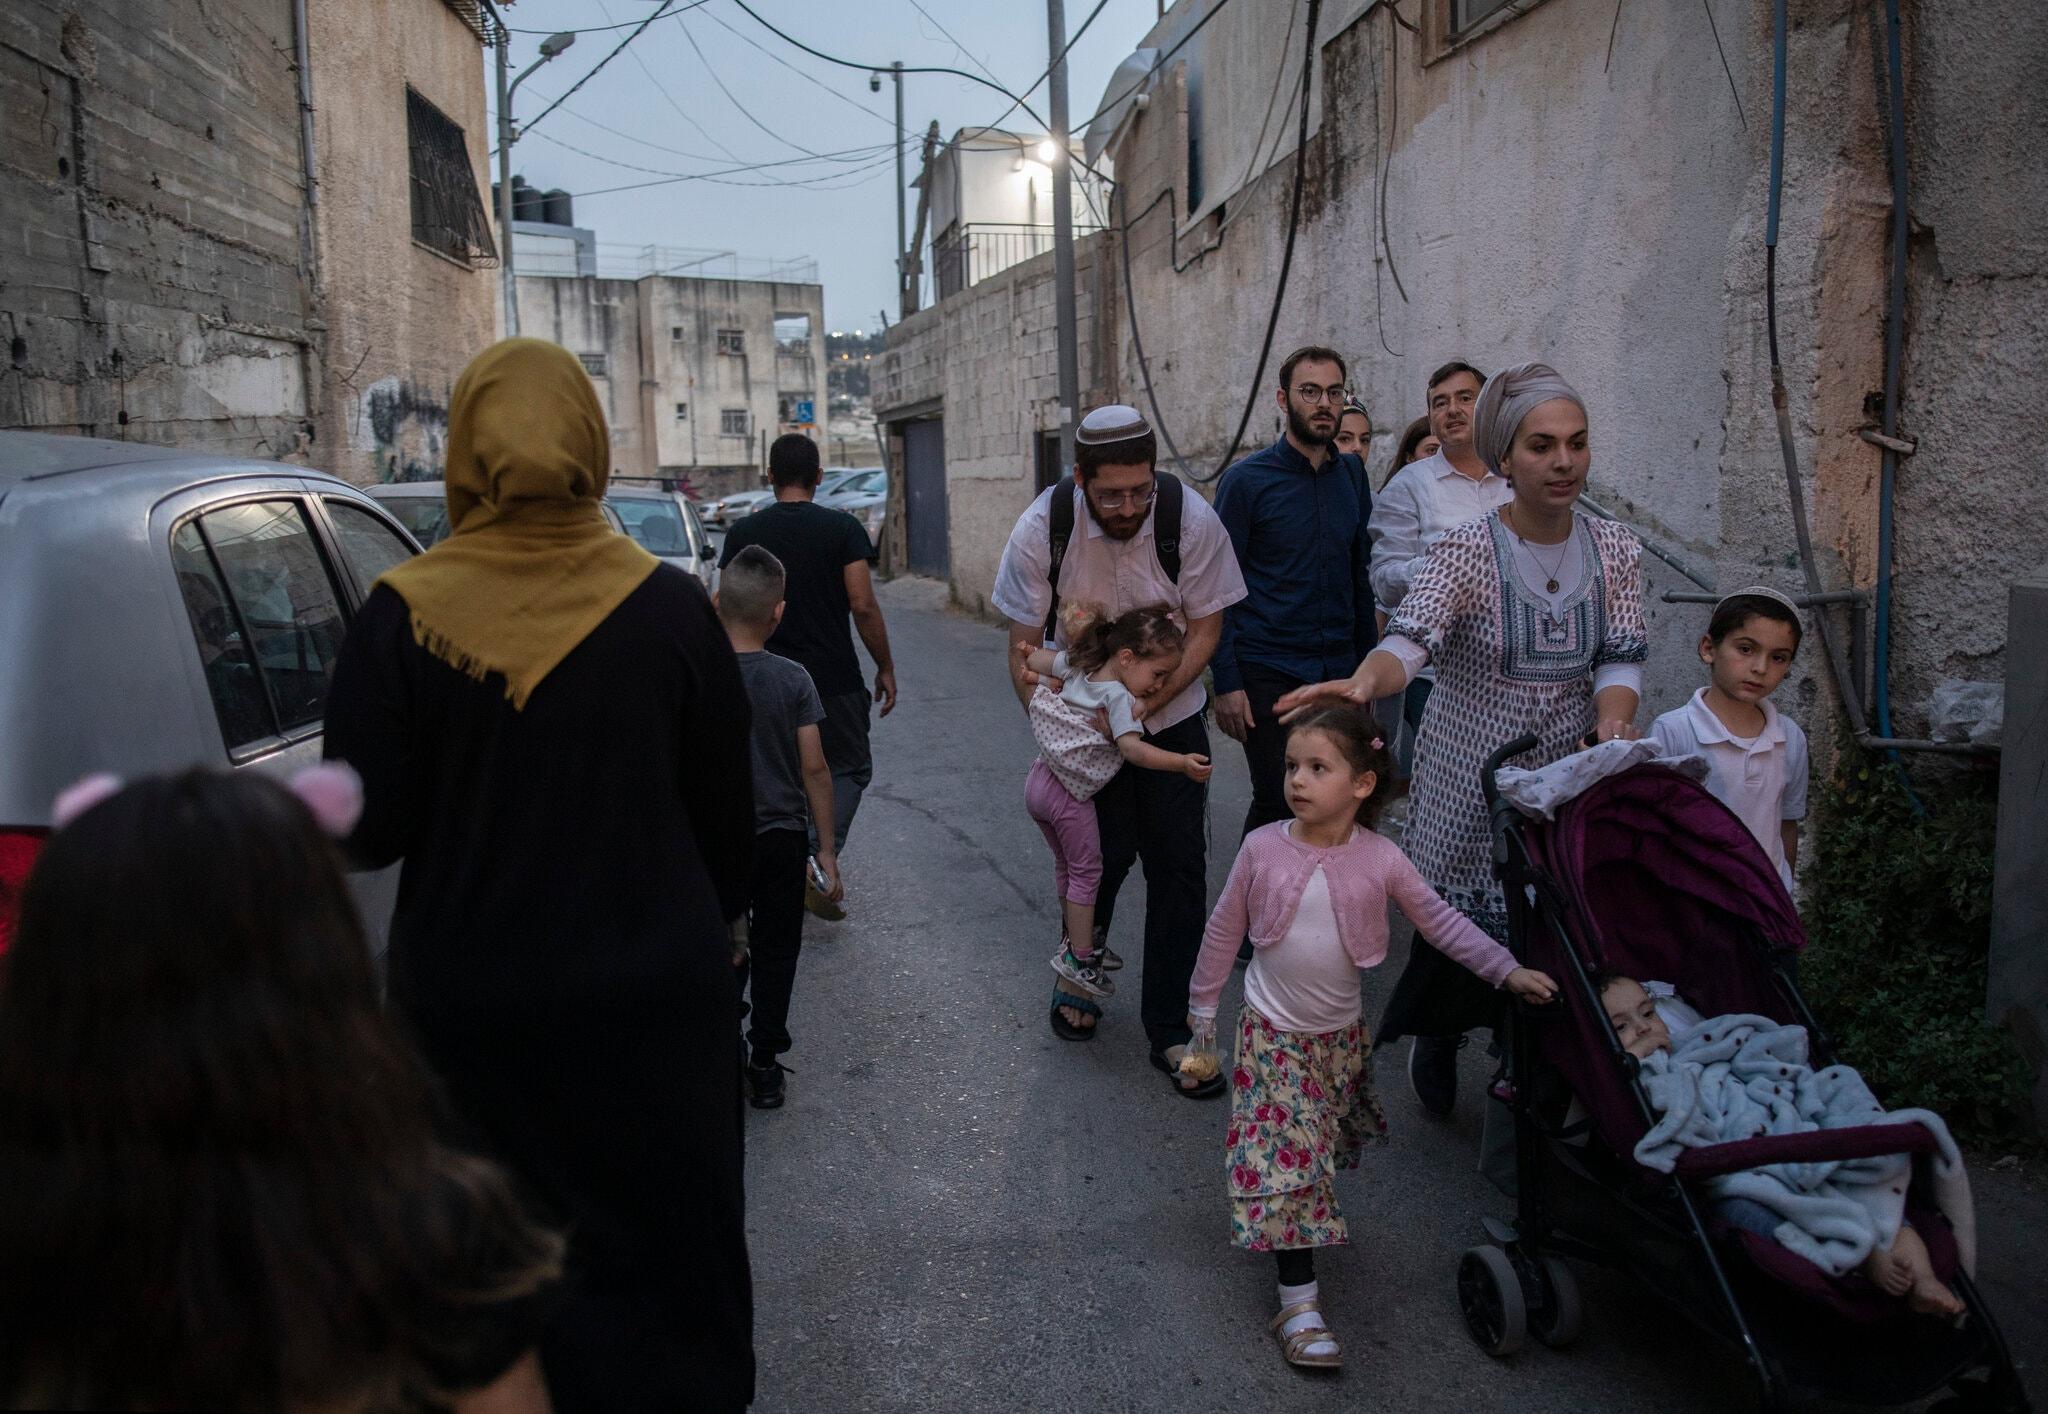 خانه ای دو تکه بین اسرائیلیان و فلسطینیان